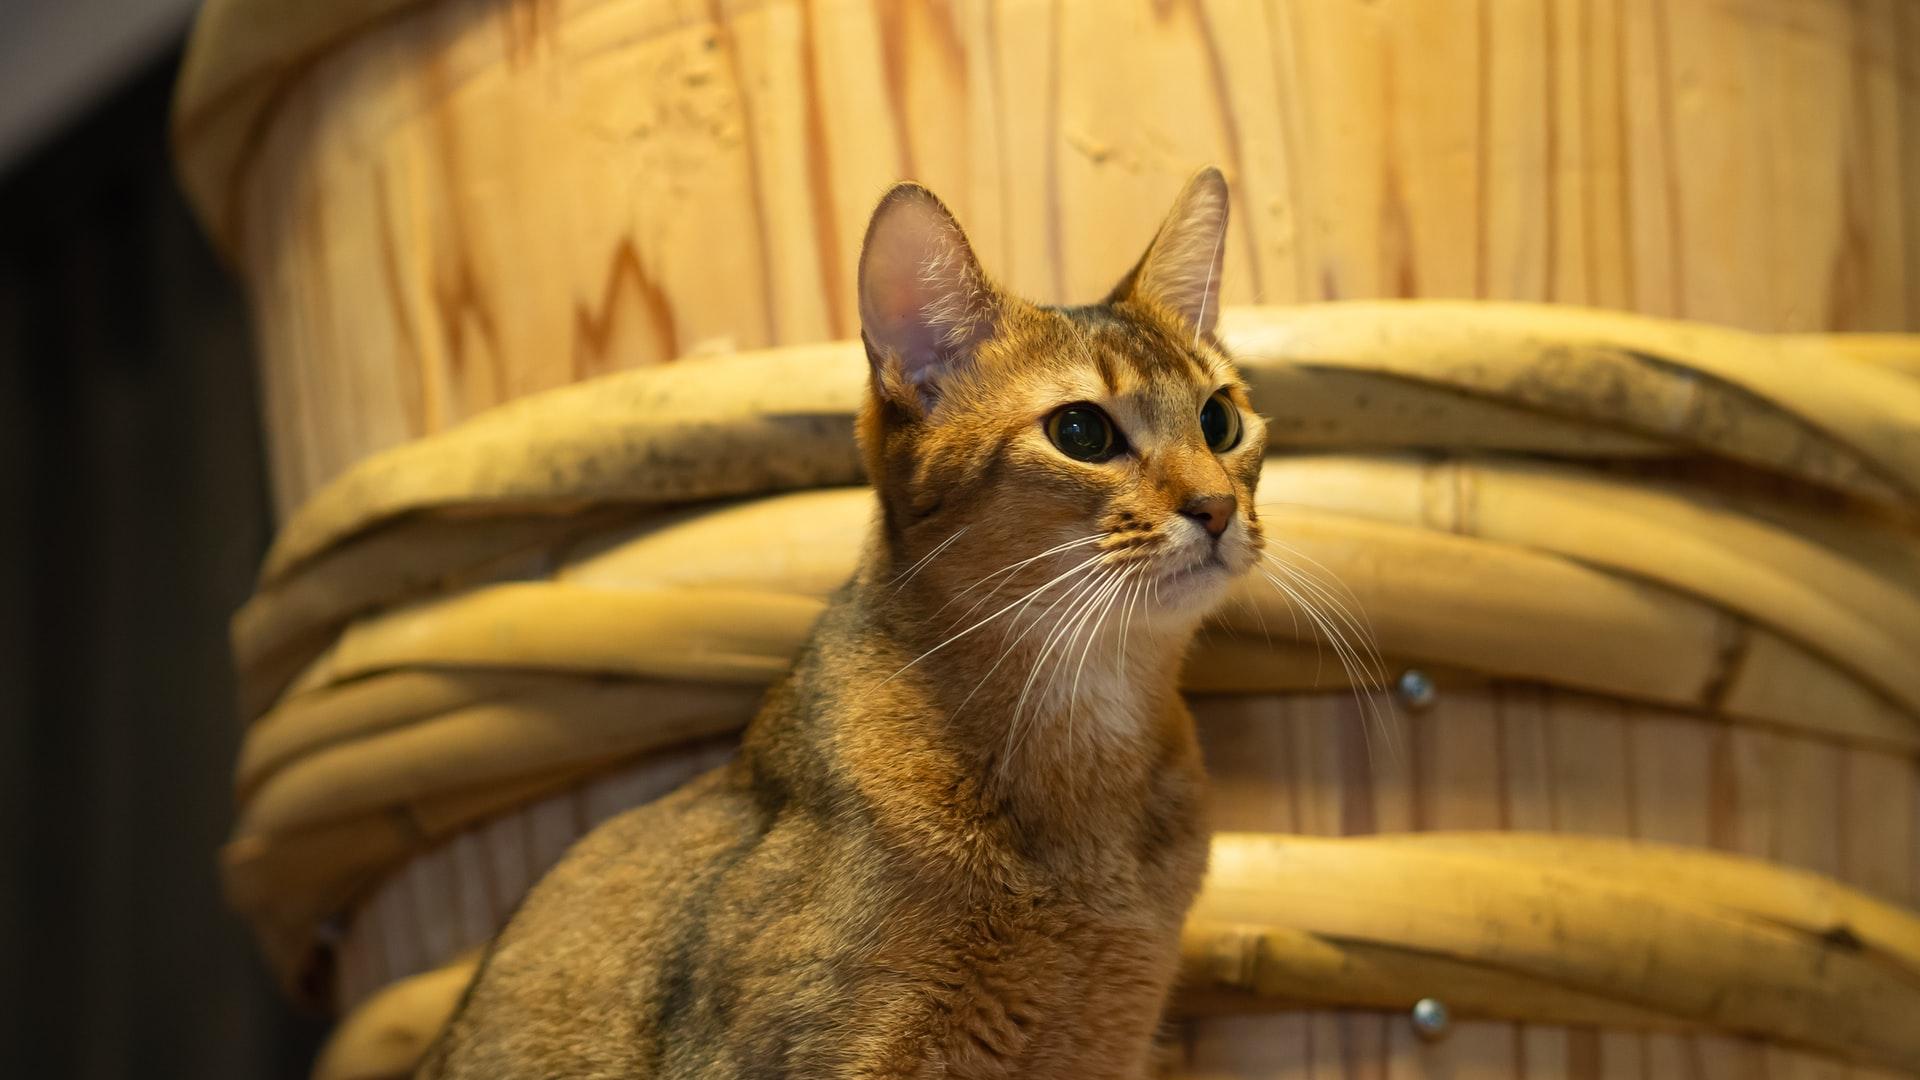 maiores racas de gatos - Chausie